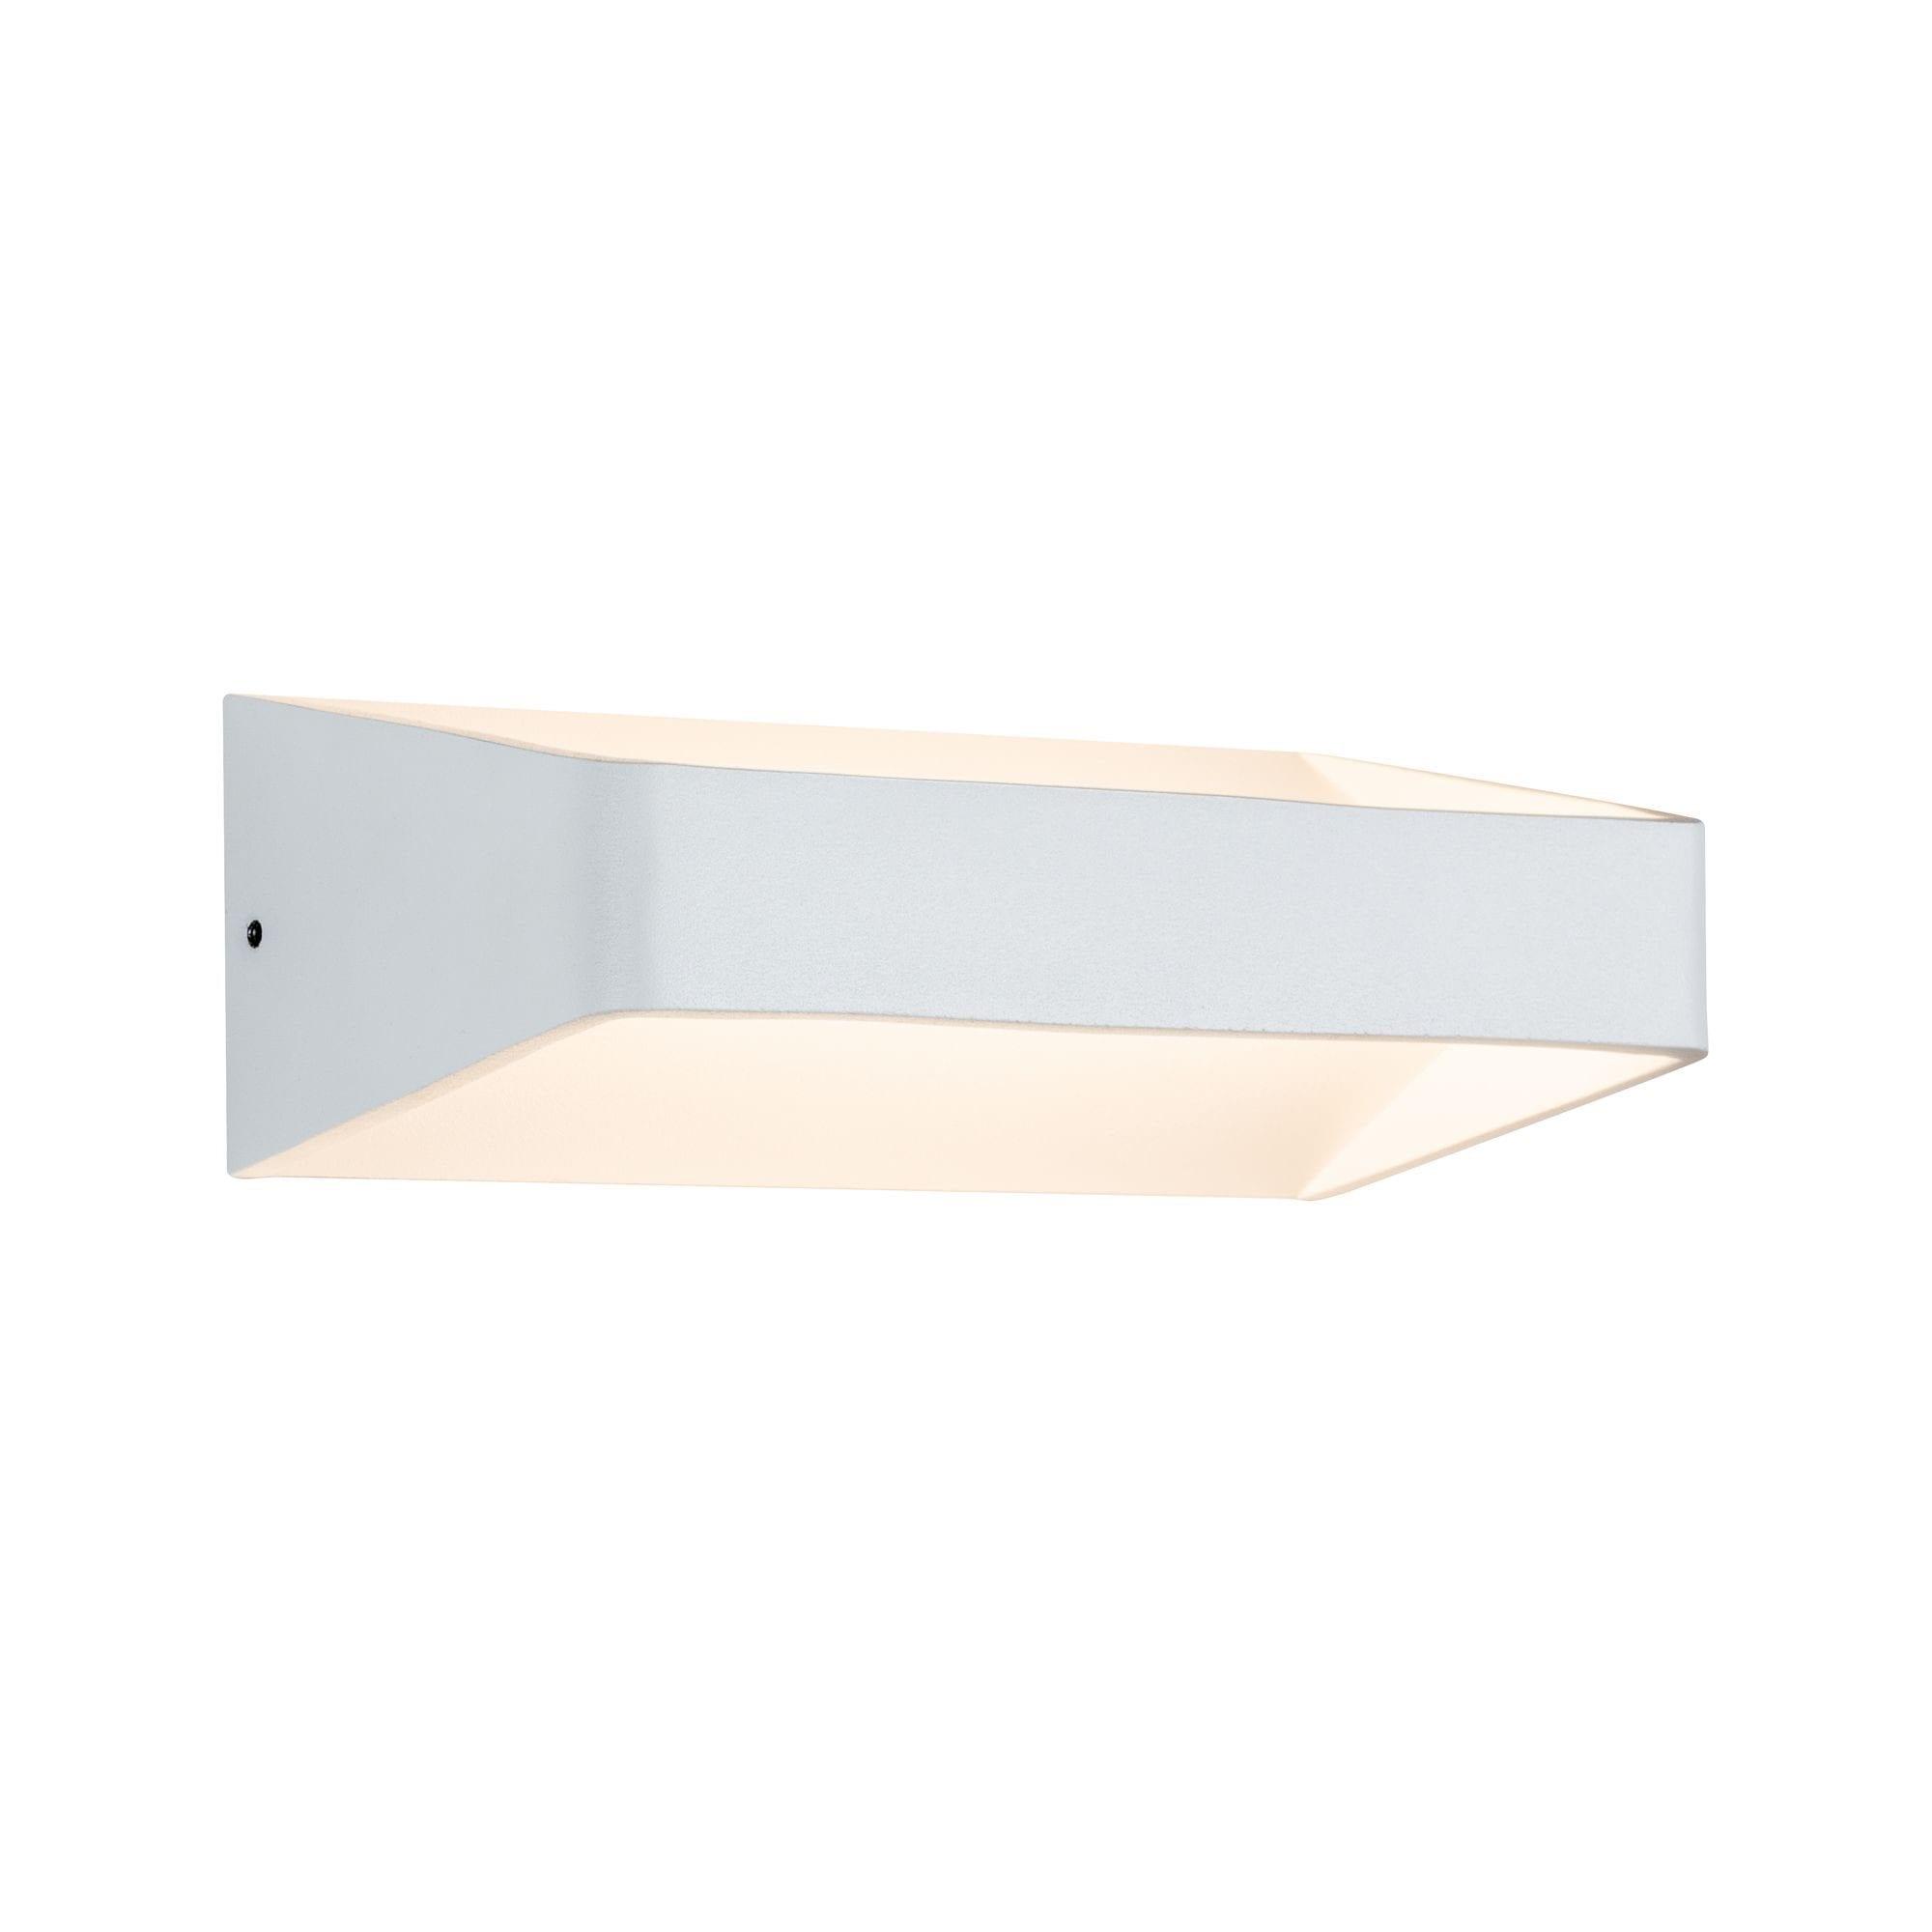 Paulmann LED Wandleuchte Bar 5,5W Weiß, 1 St., Warmweiß